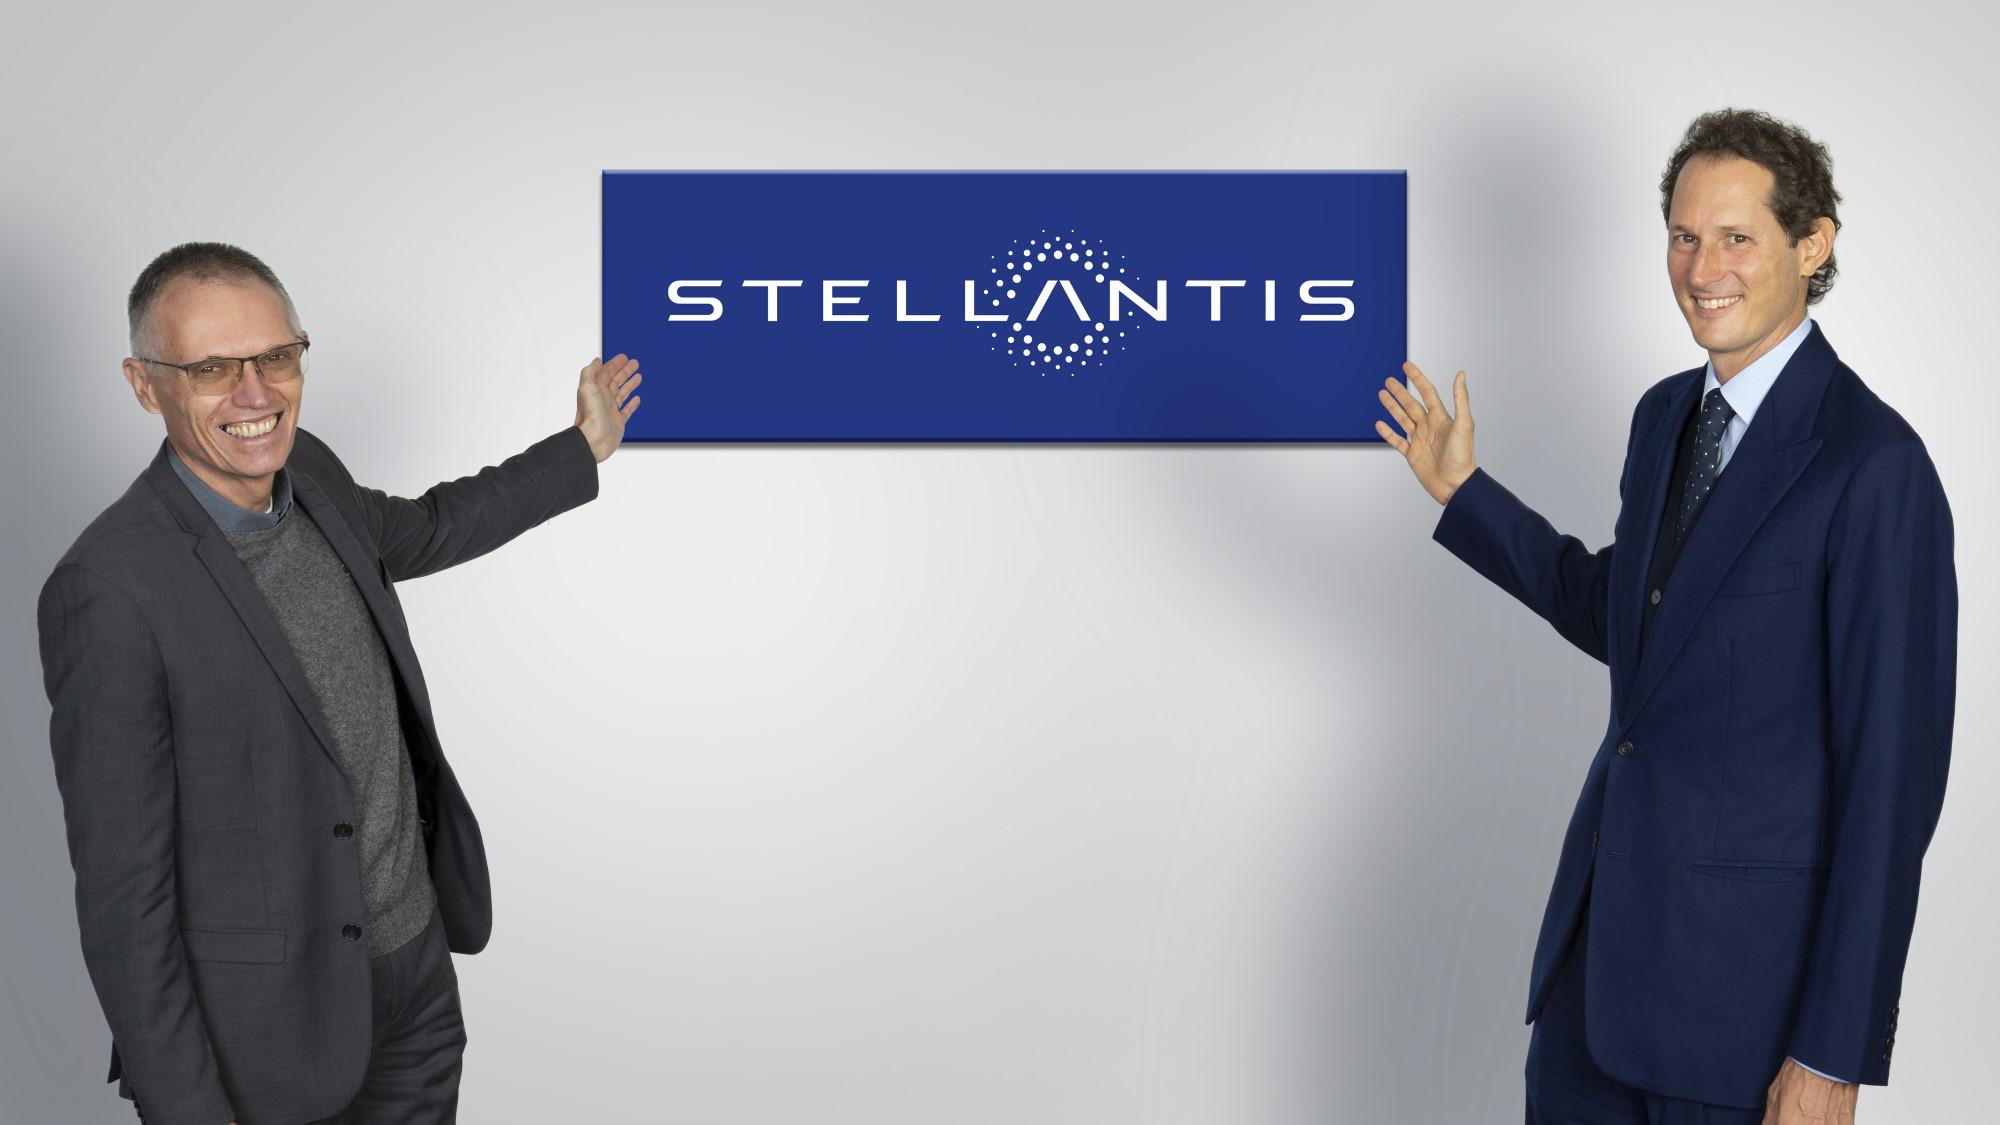 Carlos Tavares (esquerda), CEO da Stellantis, e John Elkann (Direita), Chairmann da nova empresa